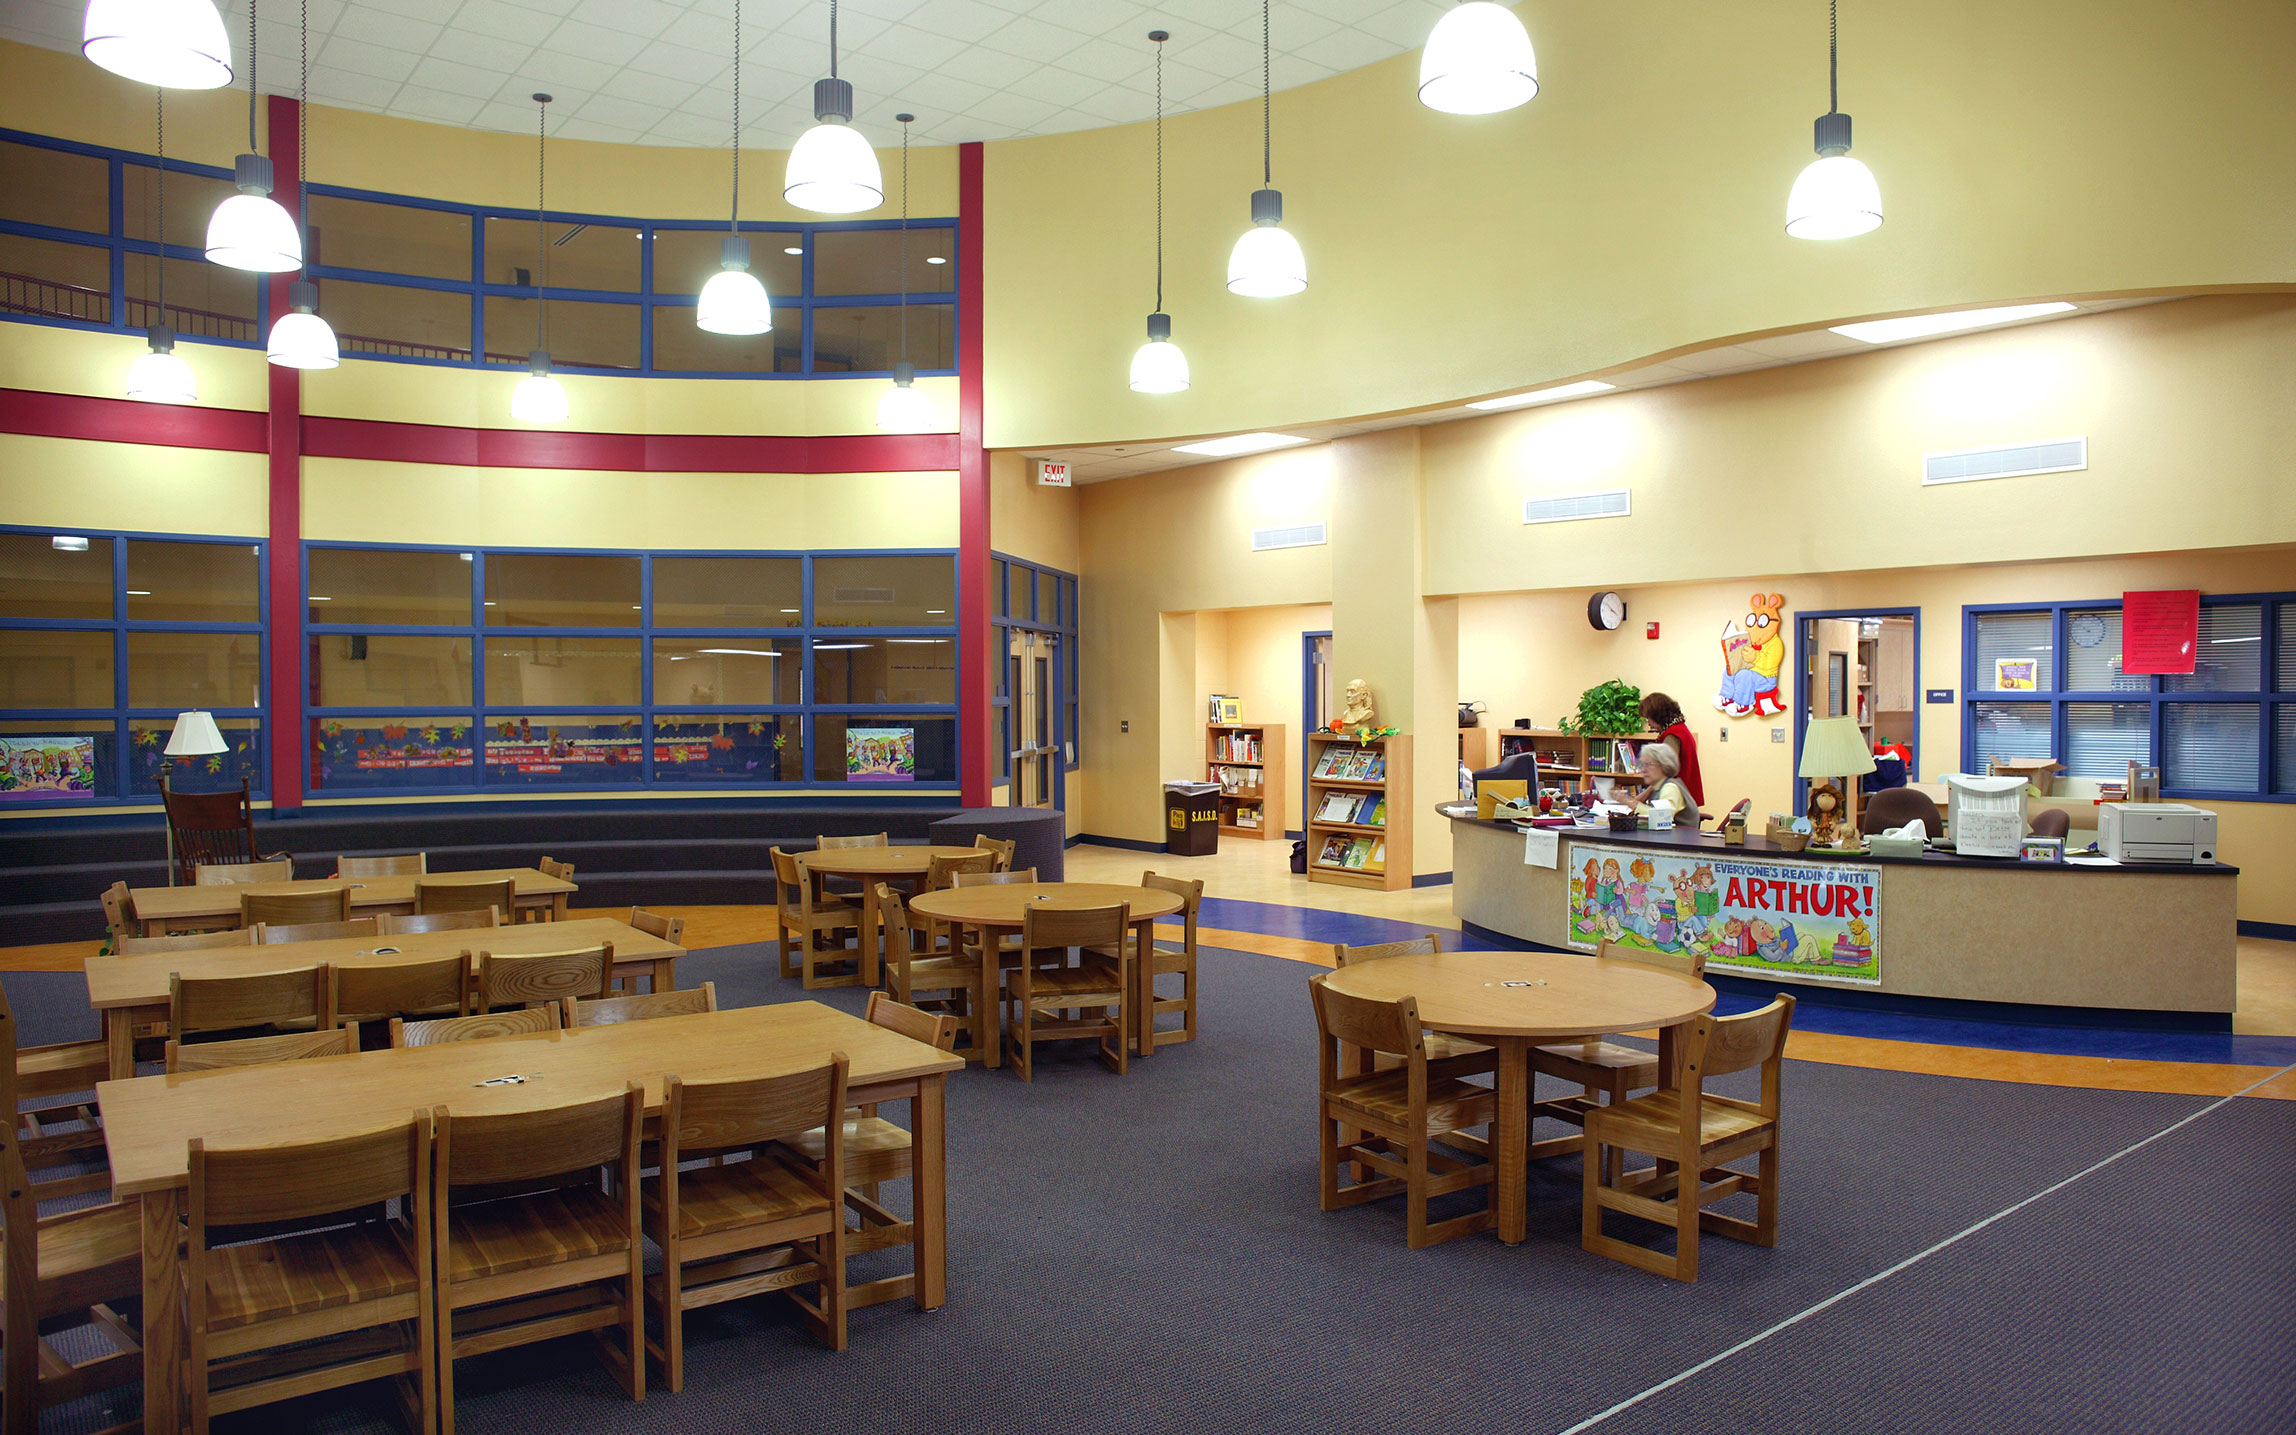 Benjamin Franklin Elementary School San Antonio Isd